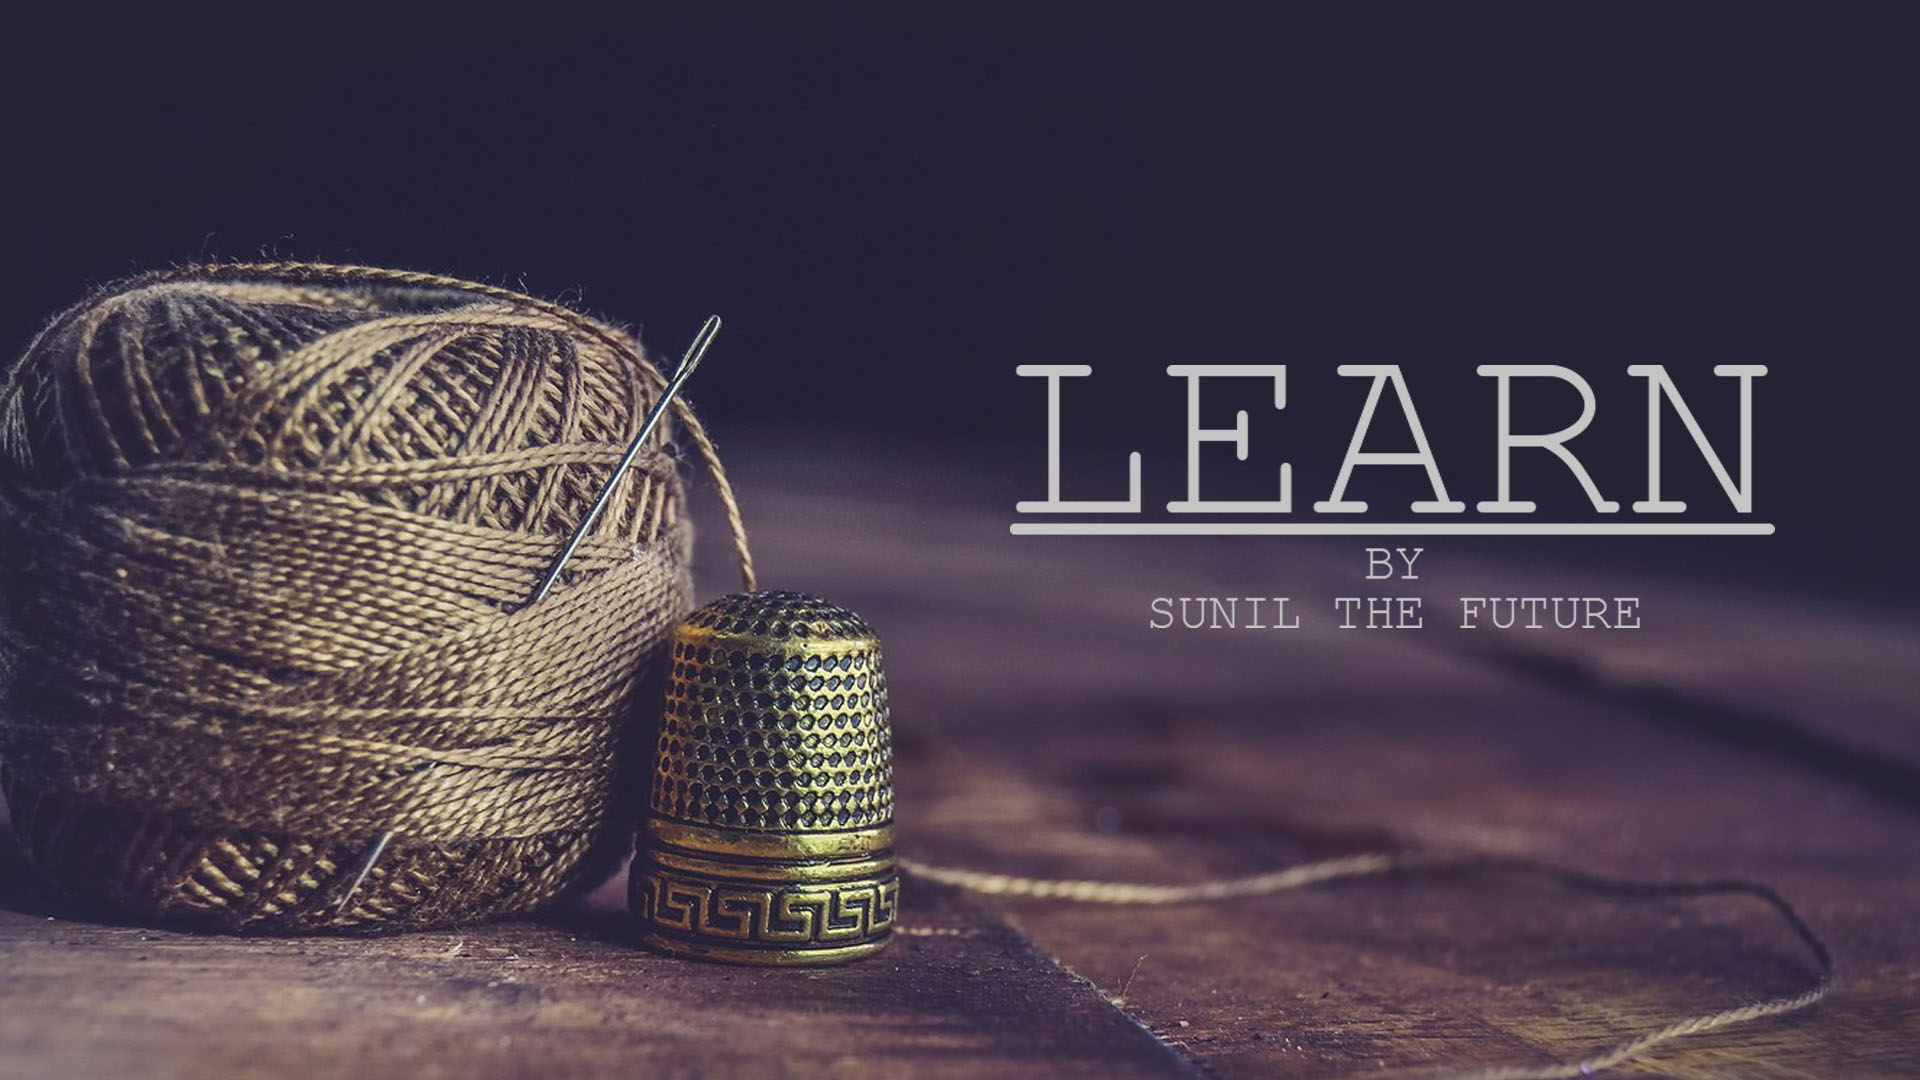 LEARN | MY RODE REEL 2020 | SUNIL THE FUTURE